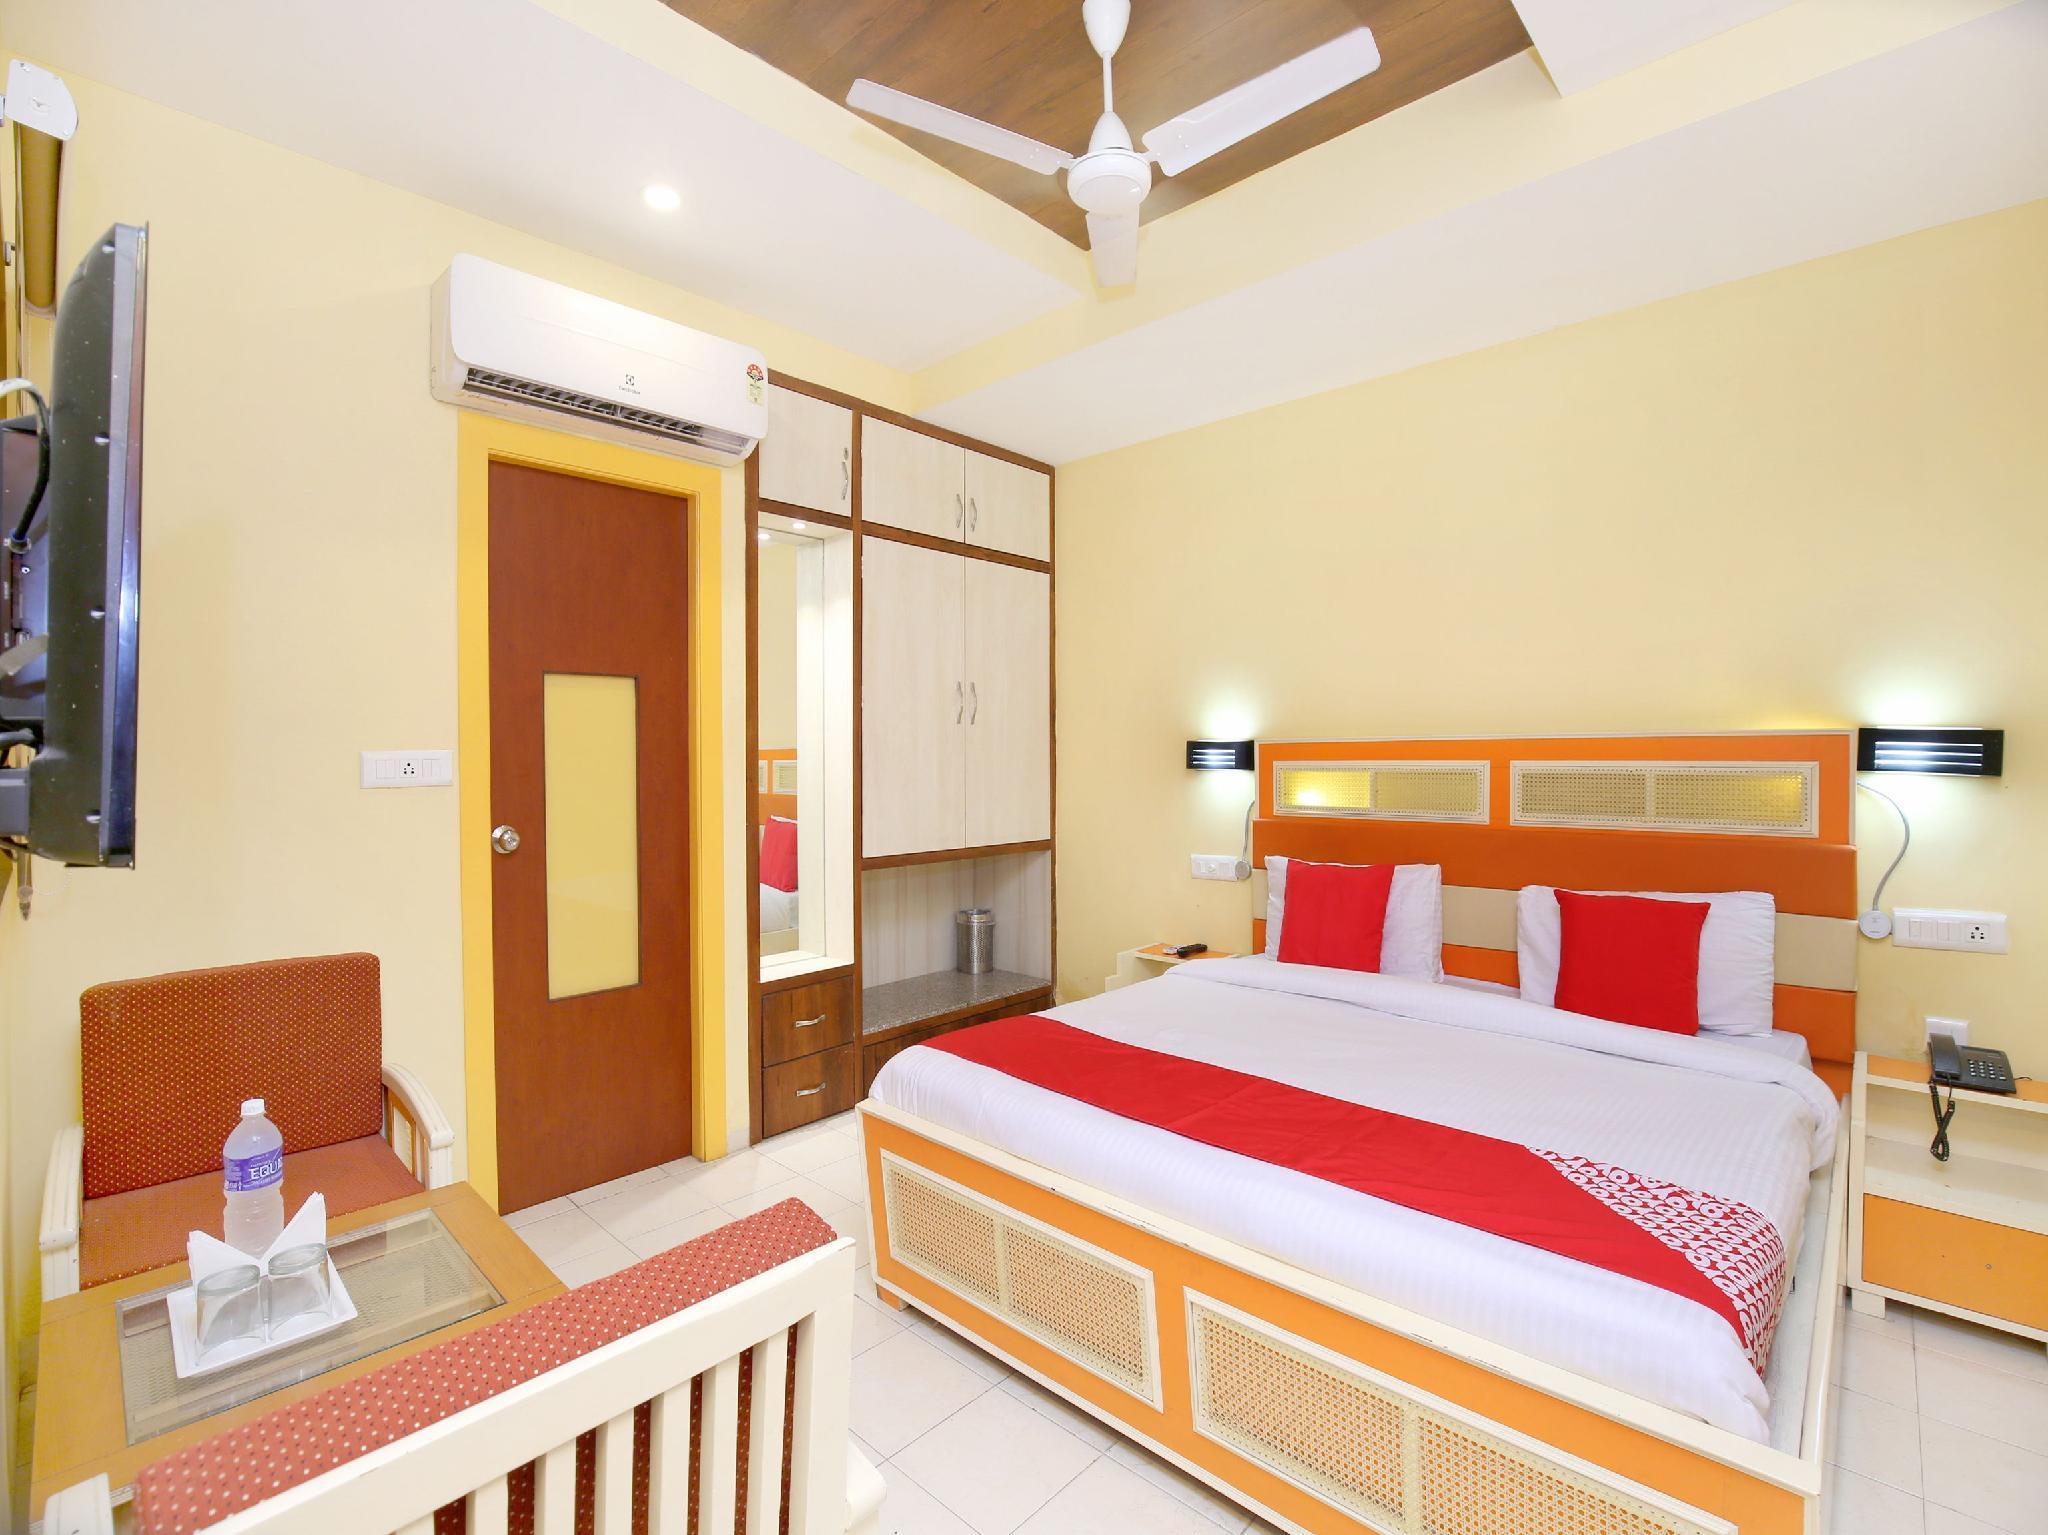 OYO 16949 Hotel Indiano